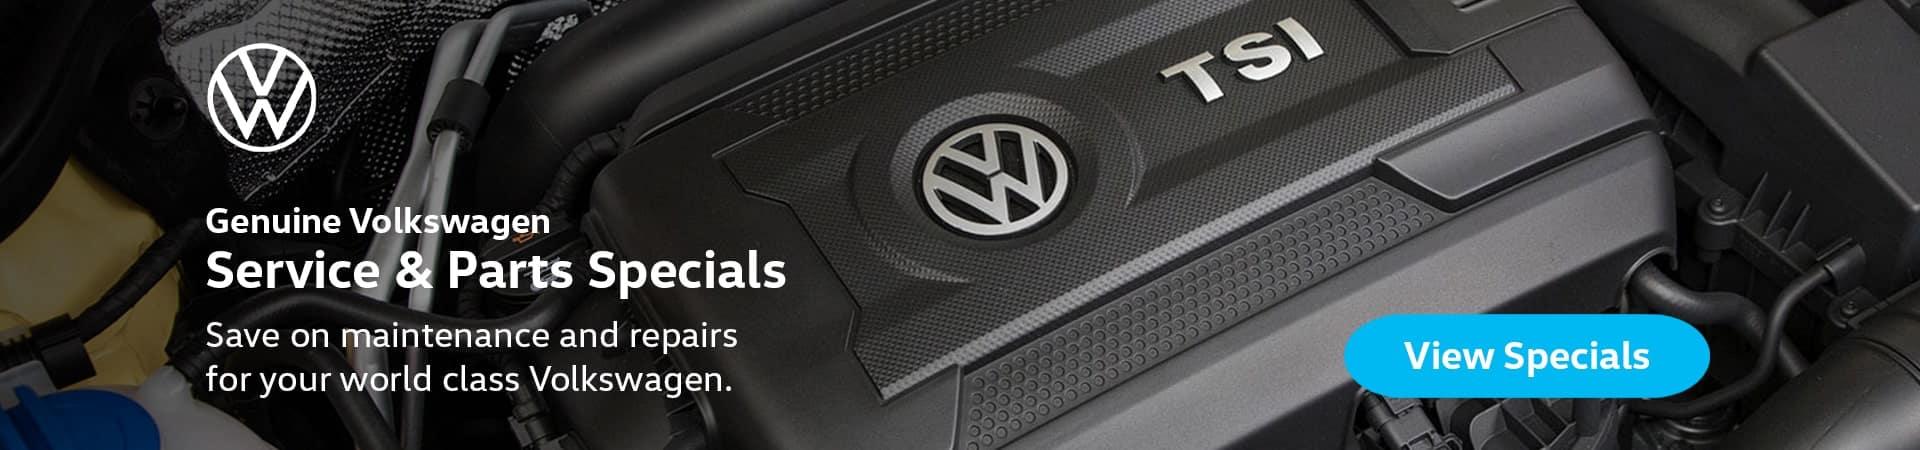 VW-smp-banner